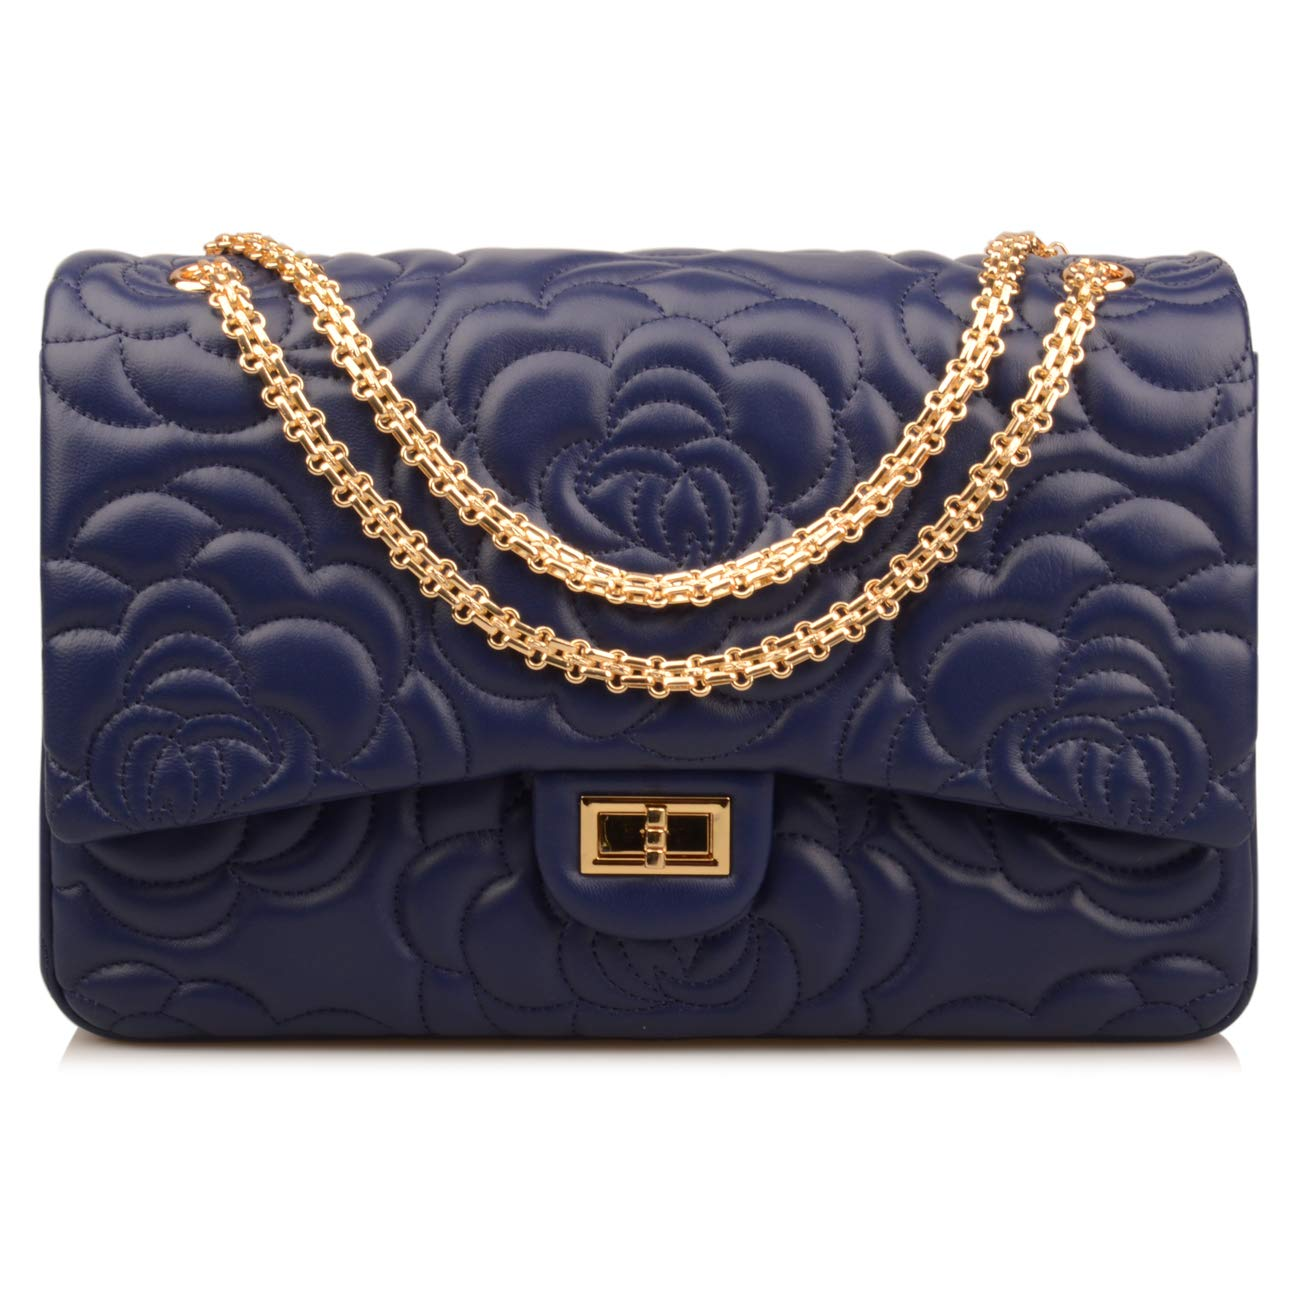 Ainifeel Women's Quilted Oversize Genuine Leather Shoulder Handbag Hobo Bag Purse (X-Large, Flower (dark blue with gold hardware)